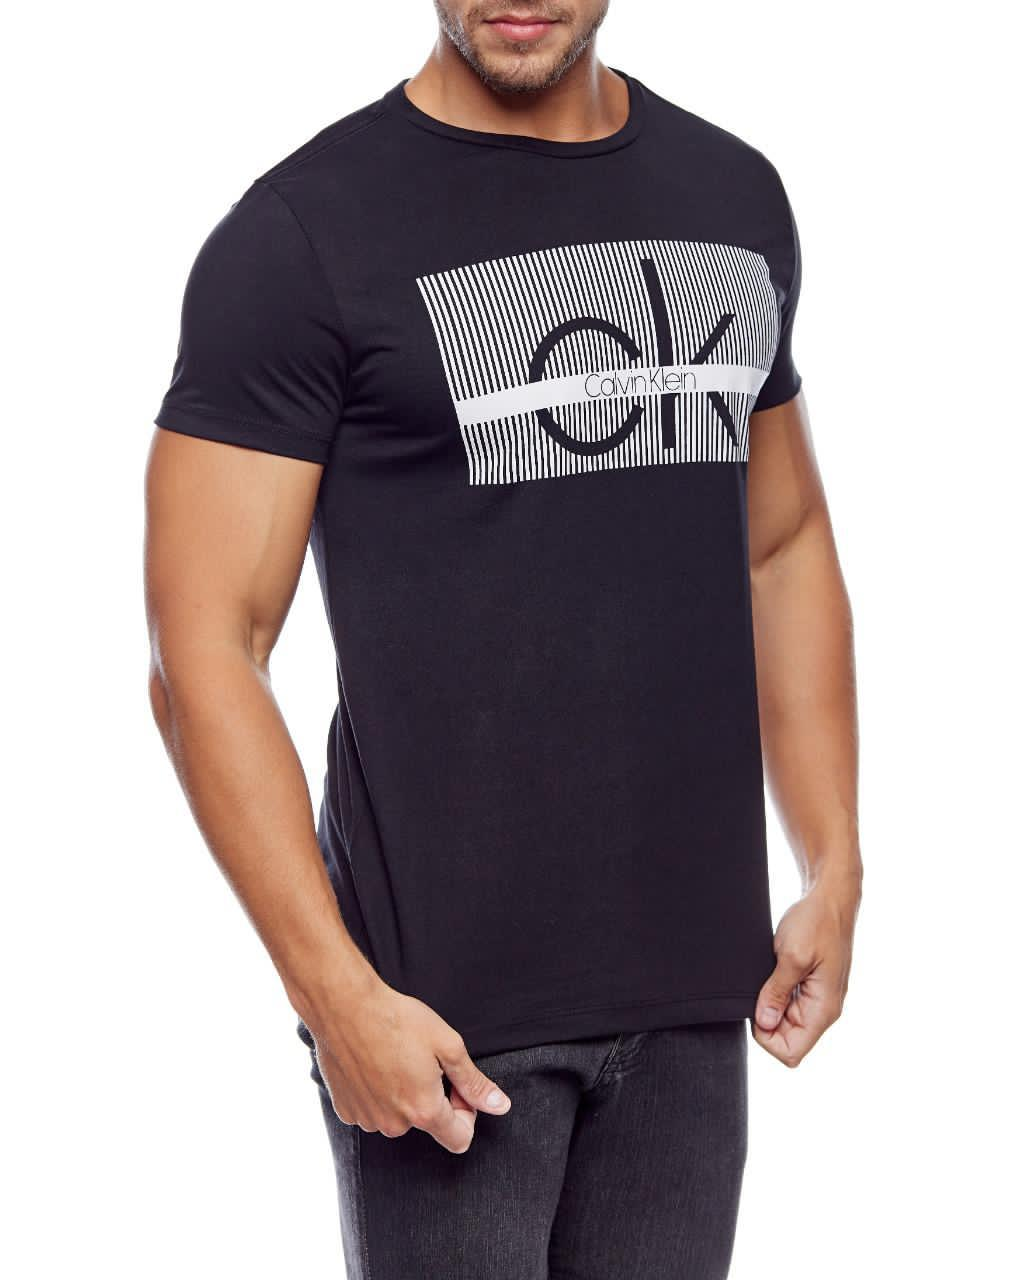 Camiseta Calvin Klein Masculina Algodão Regular Fit Lettering CK Preto